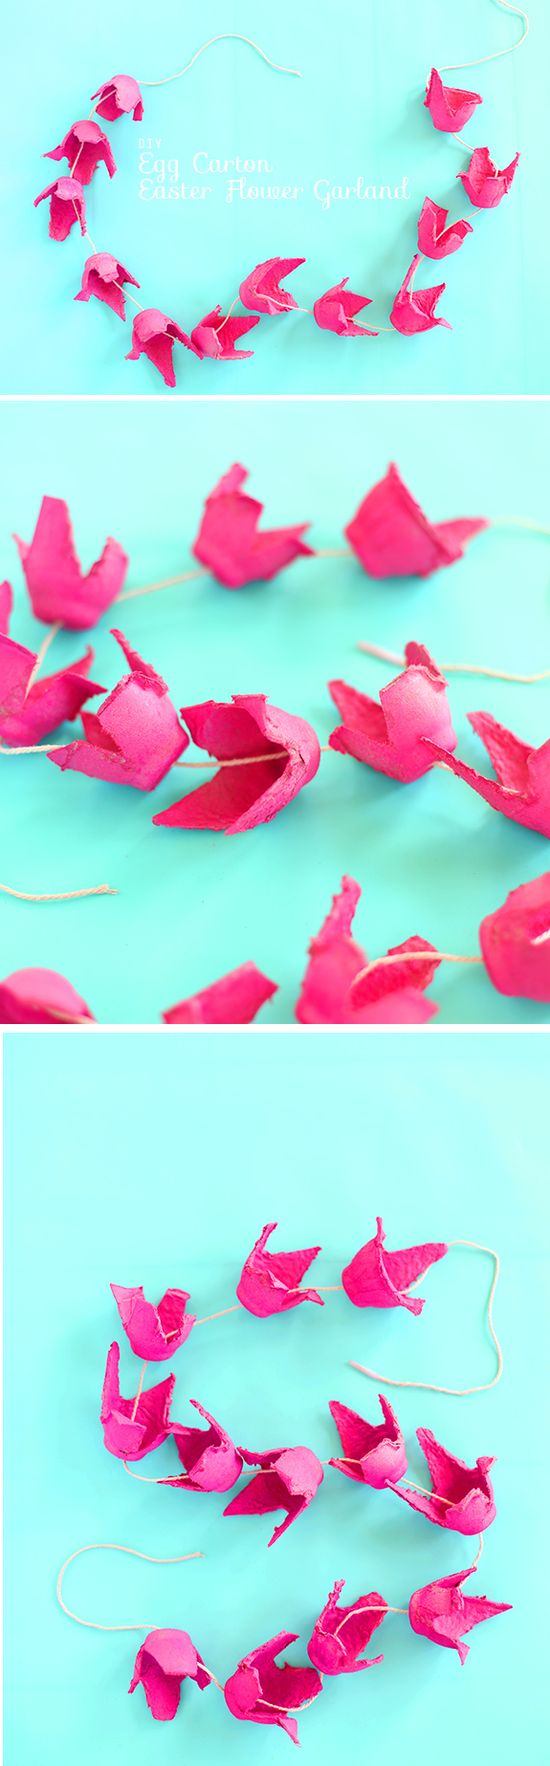 Egg Carton Flower Garland DIY  Holidays  Pinterest  Flower